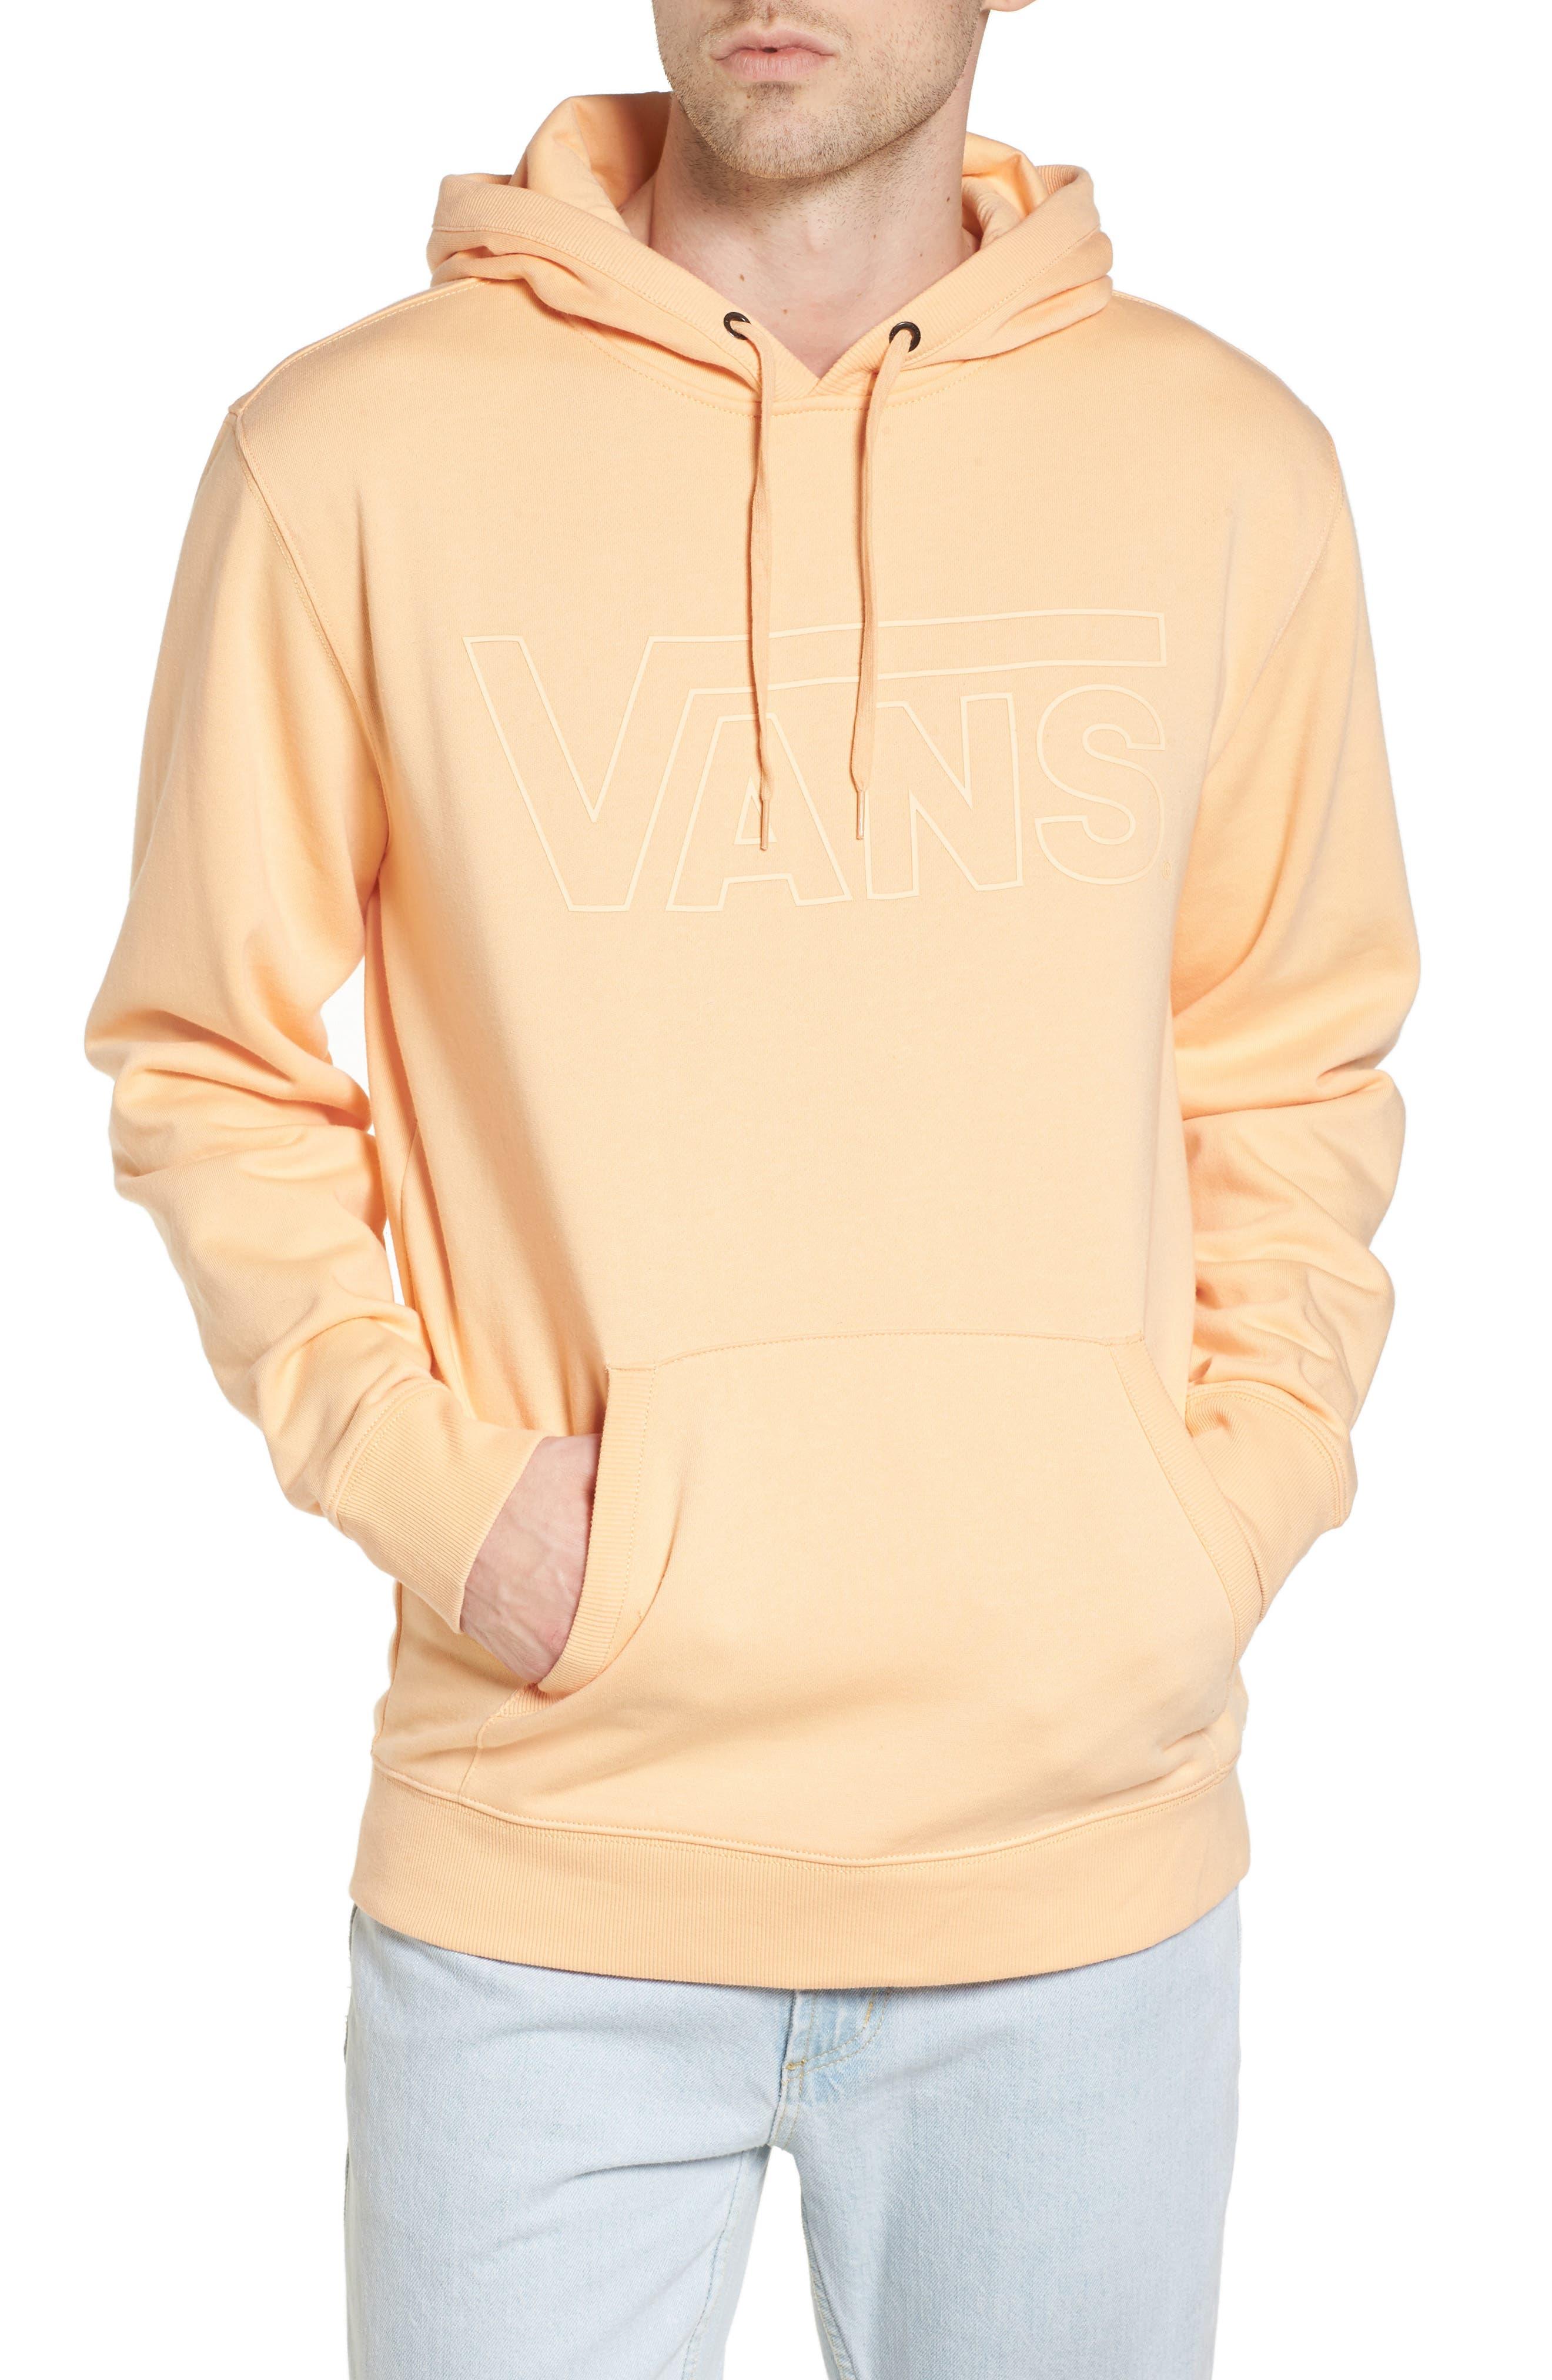 Classic Hoodie Sweatshirt,                         Main,                         color, 810